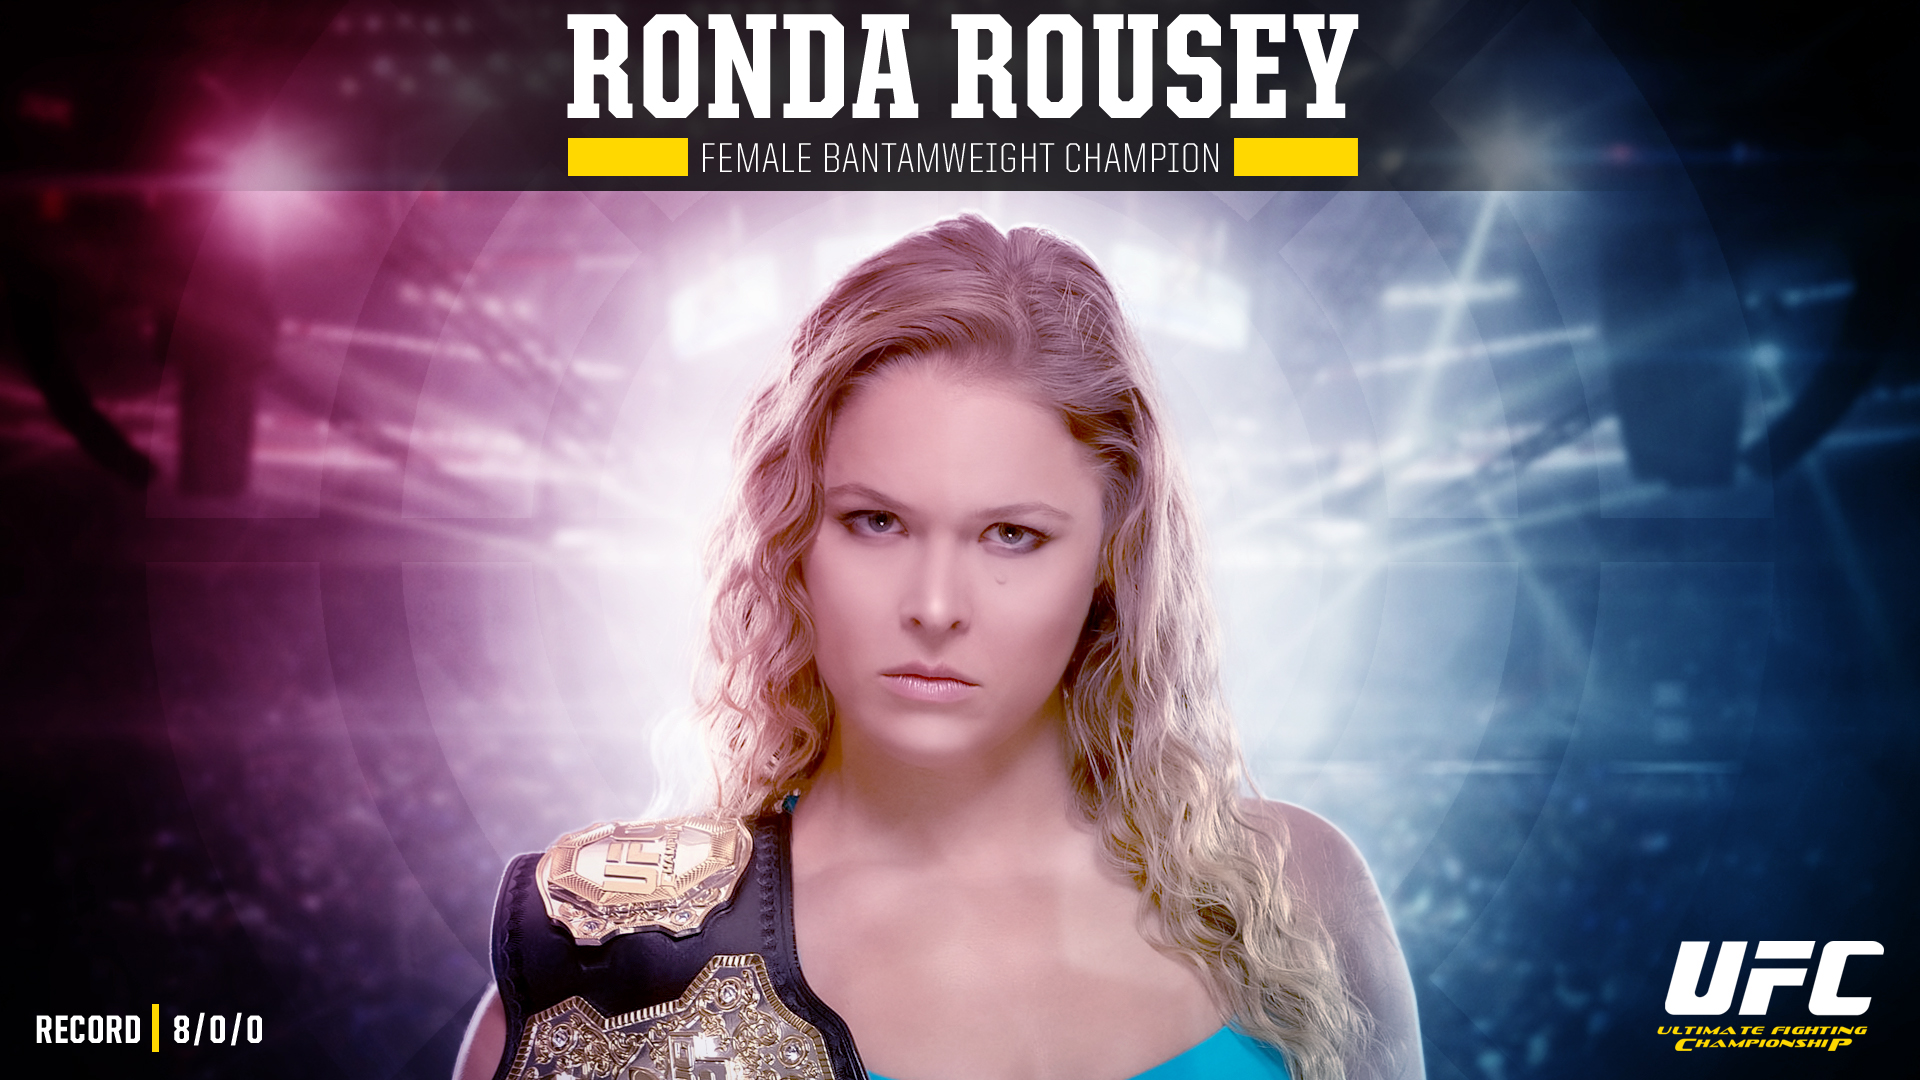 Ronda Rousey Wallpapers Download Desktop Wallpaper Images 1920x1080